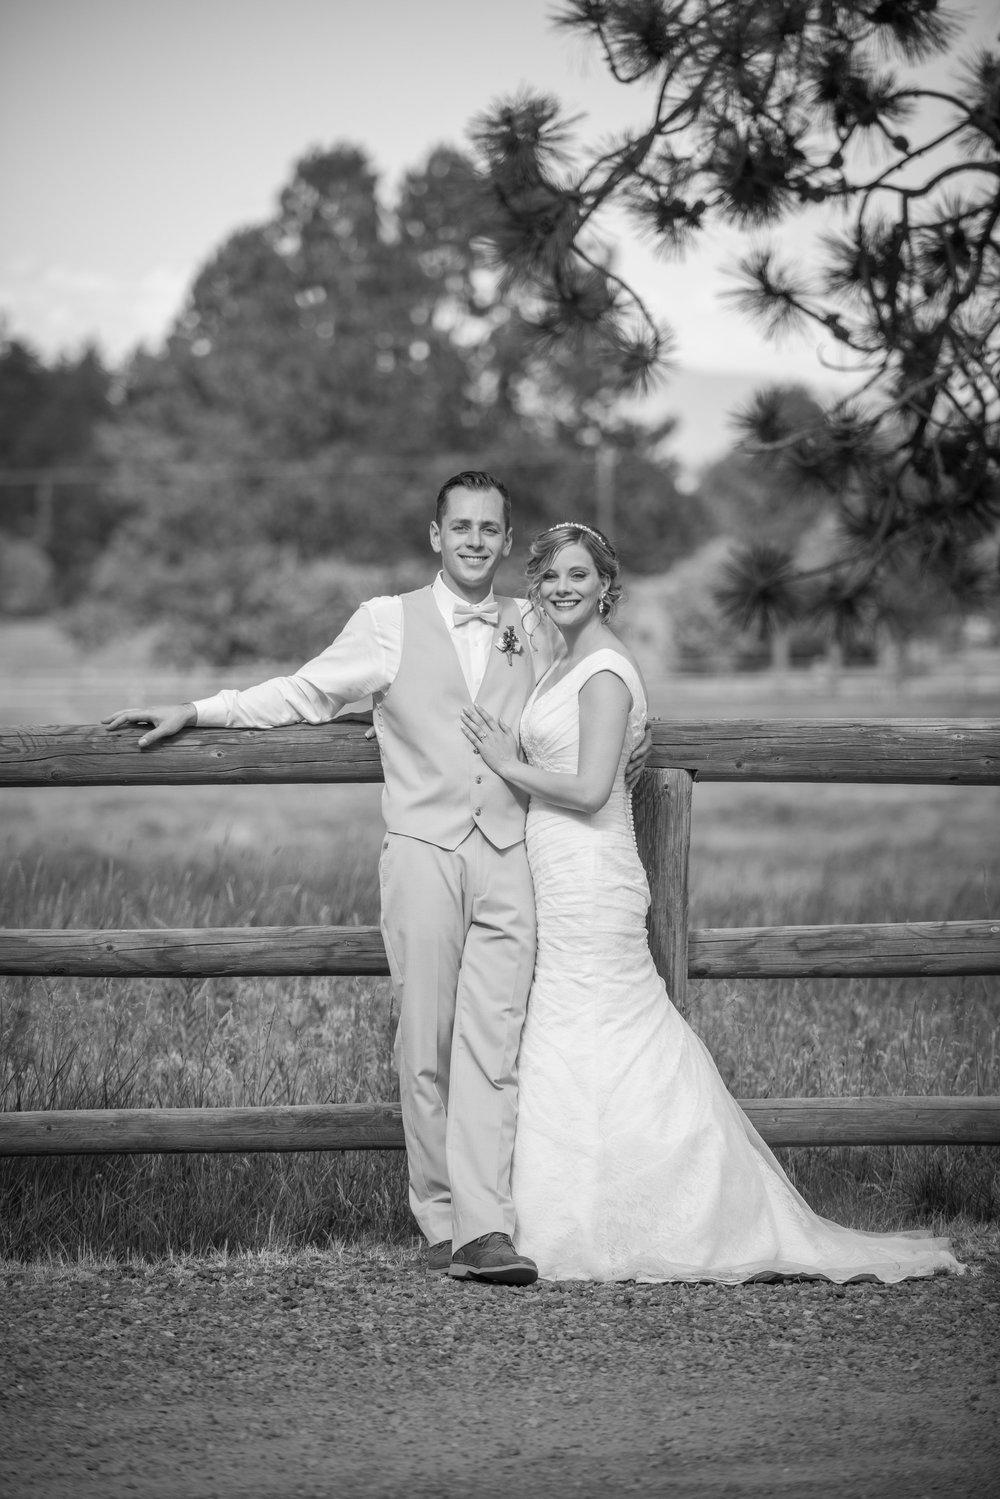 Bend-Oregon-Wedding-Rustic-Chic-Lacey-Krystian-Sauvage-Fleur-Design